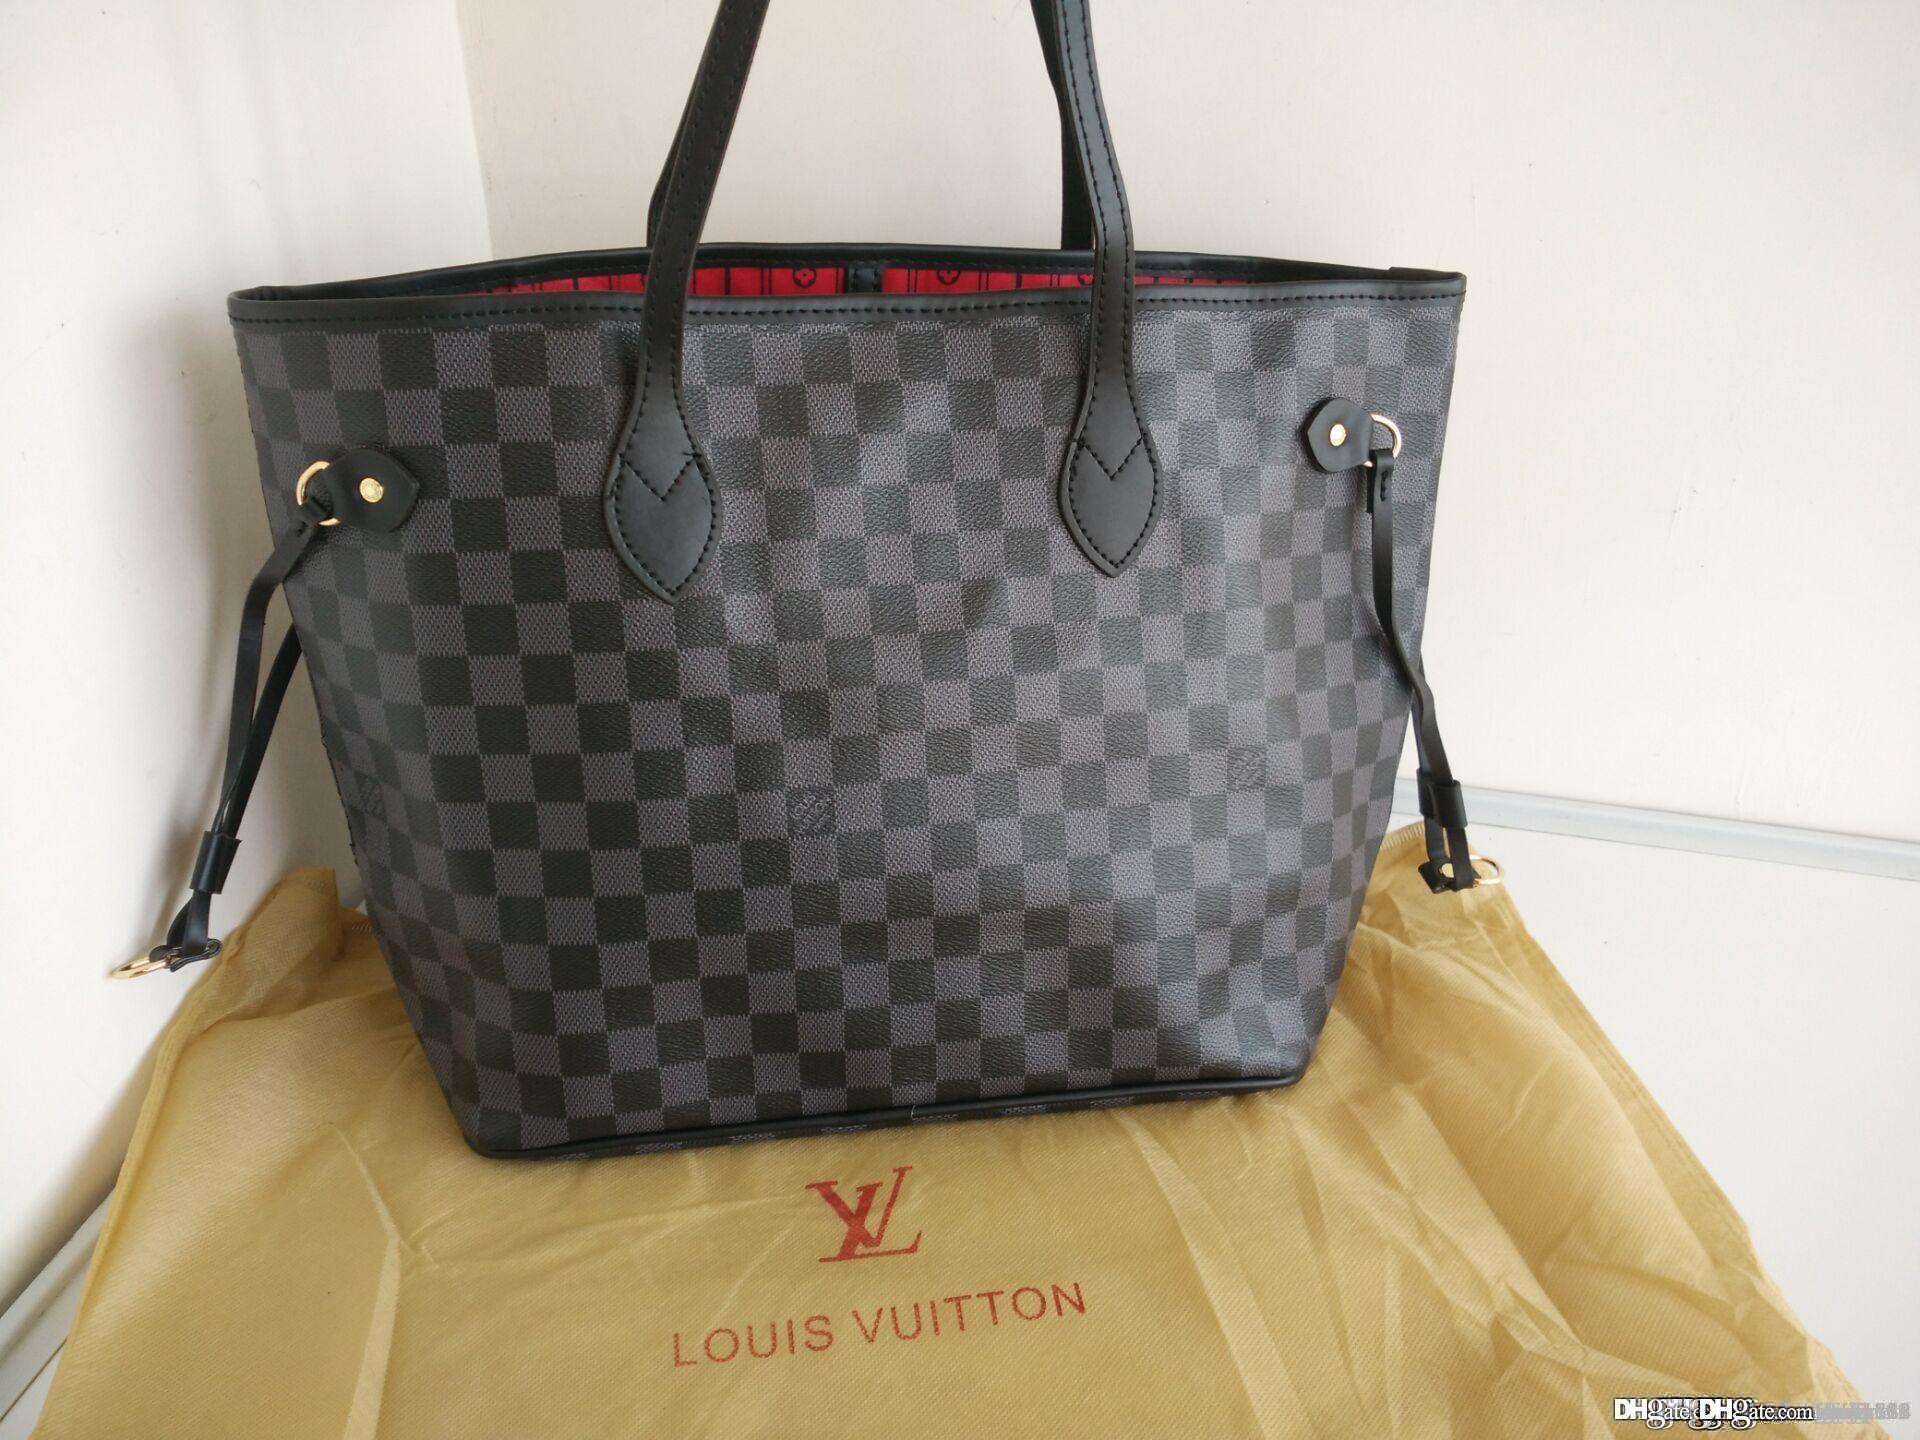 7f2487c5fa60 Louis Vuitton Women NEVERFULHANDBAGS WOMEN LEATHER BAGS MEENER BAGS BIG  TOTE MICHAEL V88 KOR HOULDER BAGS B2e GUCCI LV Supreme Bag Bags Hair  Jewelry Wedding ...